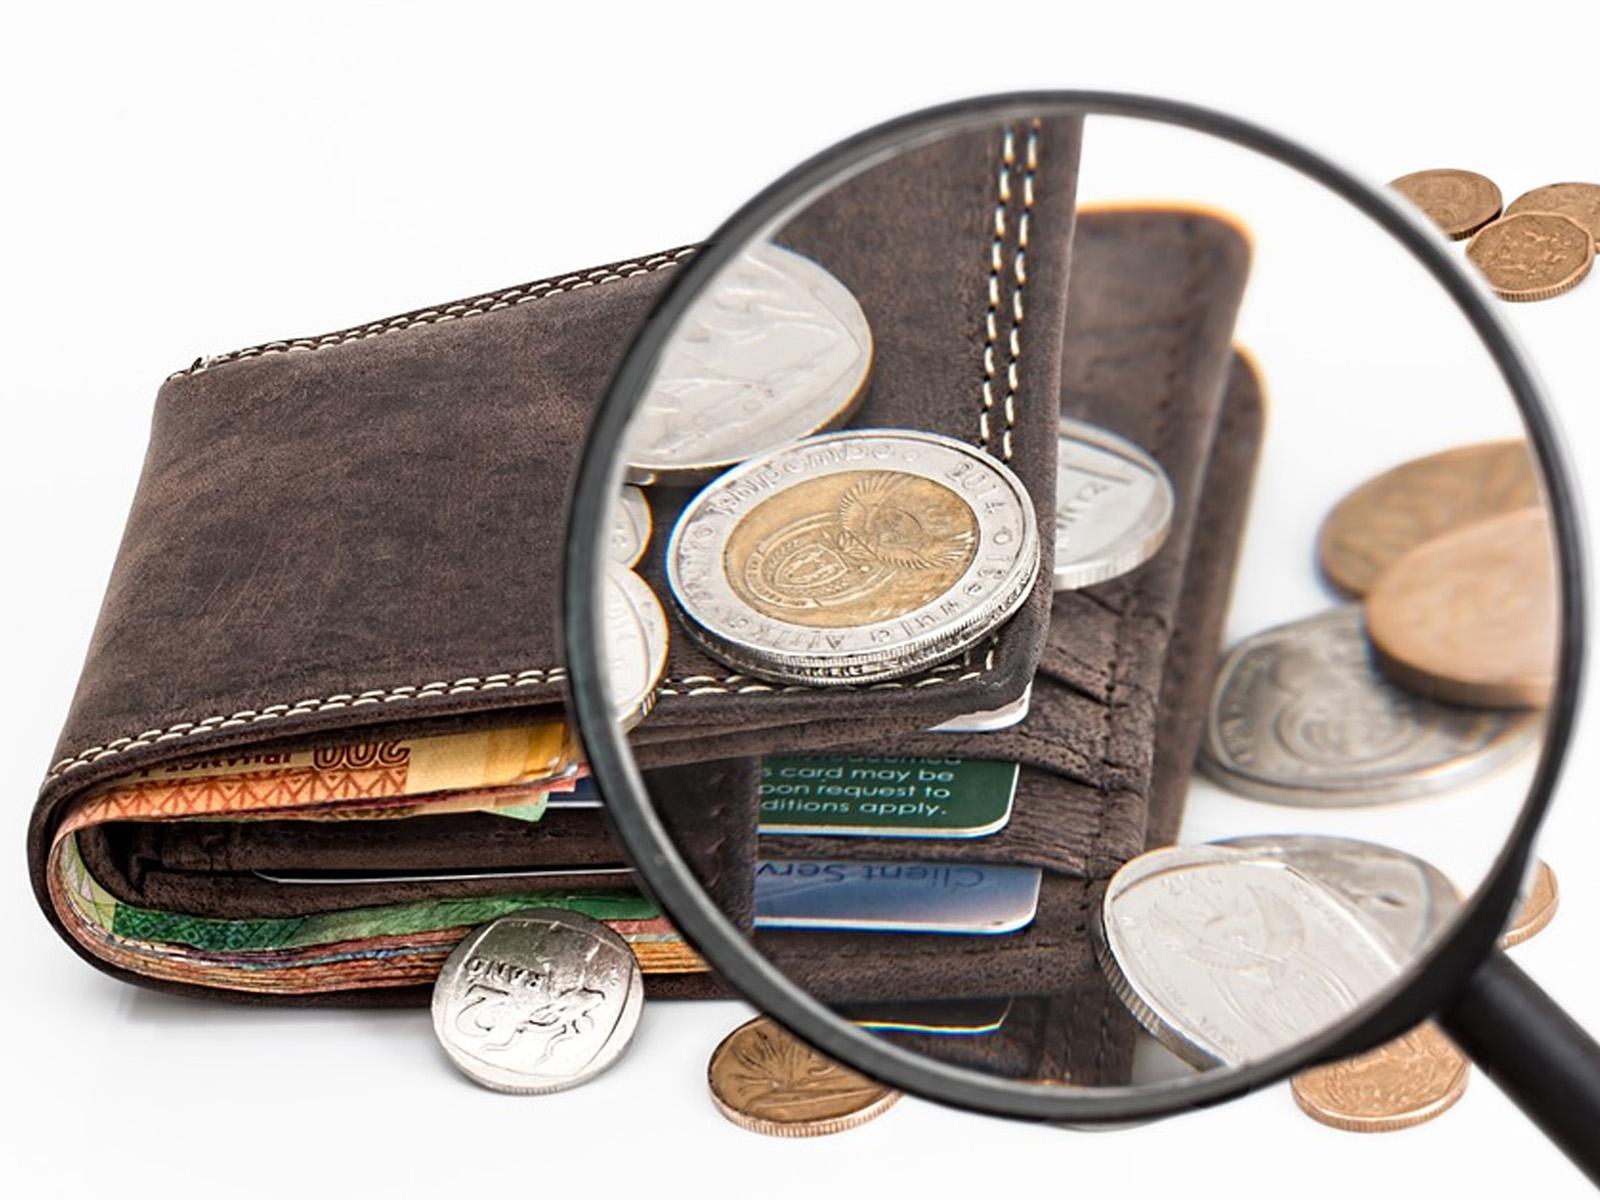 Begini Cara Mengatur Keuangan Di Usia 20-An Agar Hidup Lebih Makmur